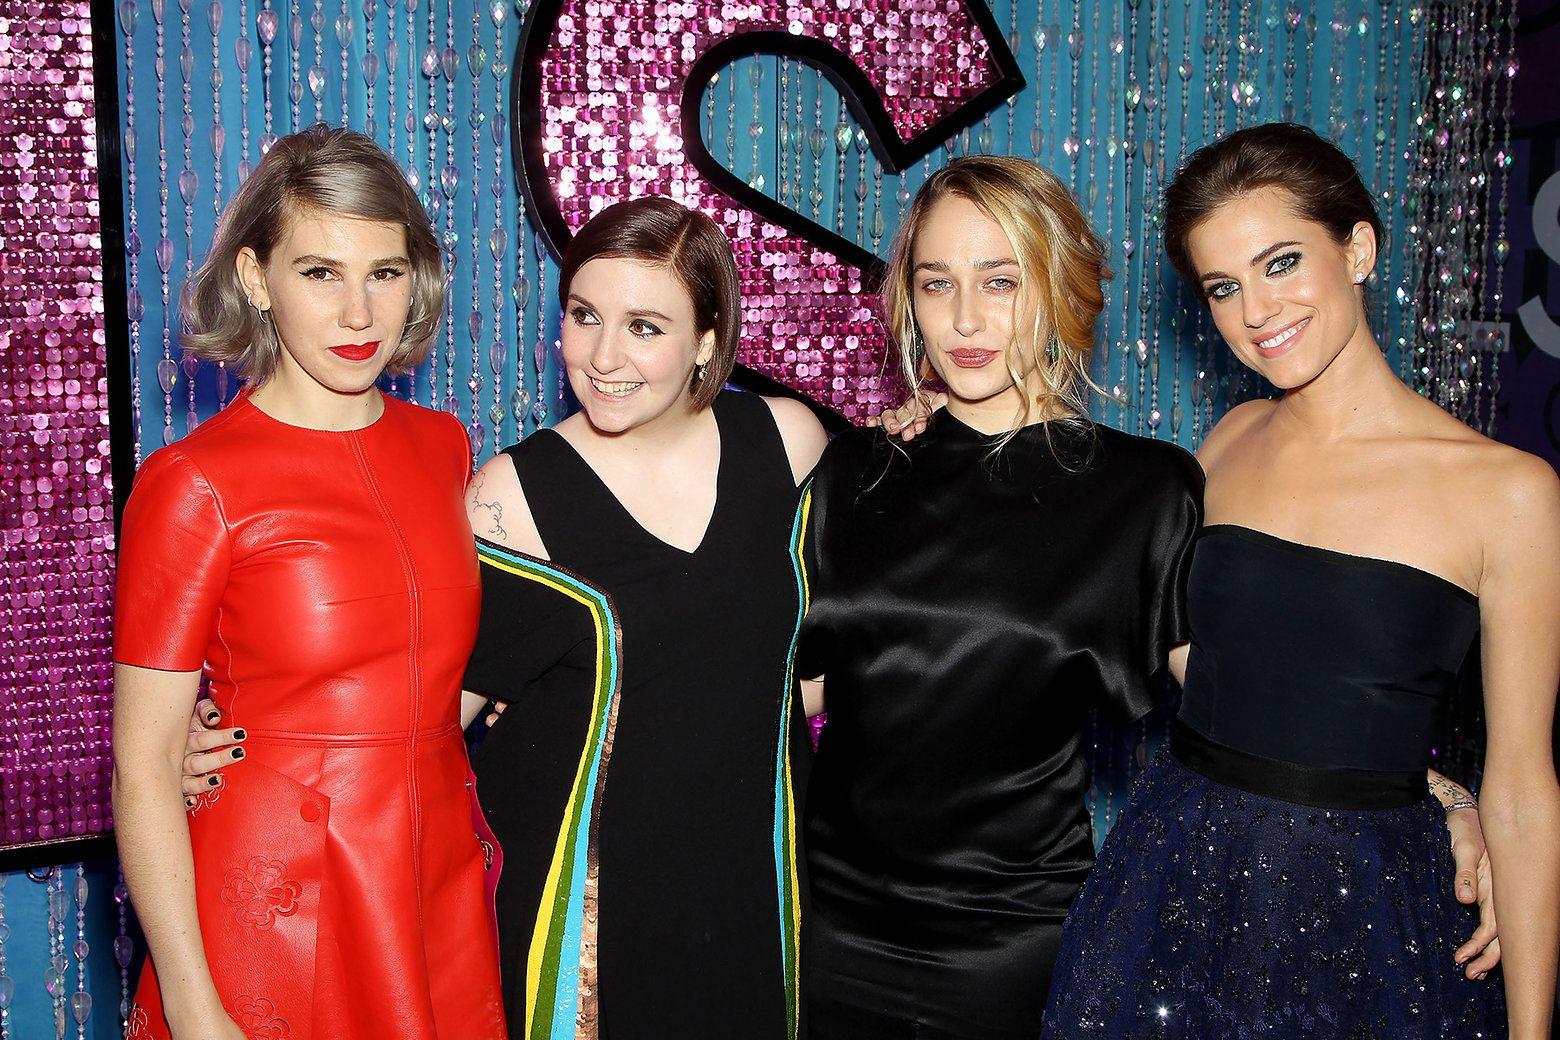 Zosia Mamet, Lena Dunham, Jemima Kirke, and Allison Williams - Photo: Marion Curtis, Starpix / HBO. Girls season 4 premiere.